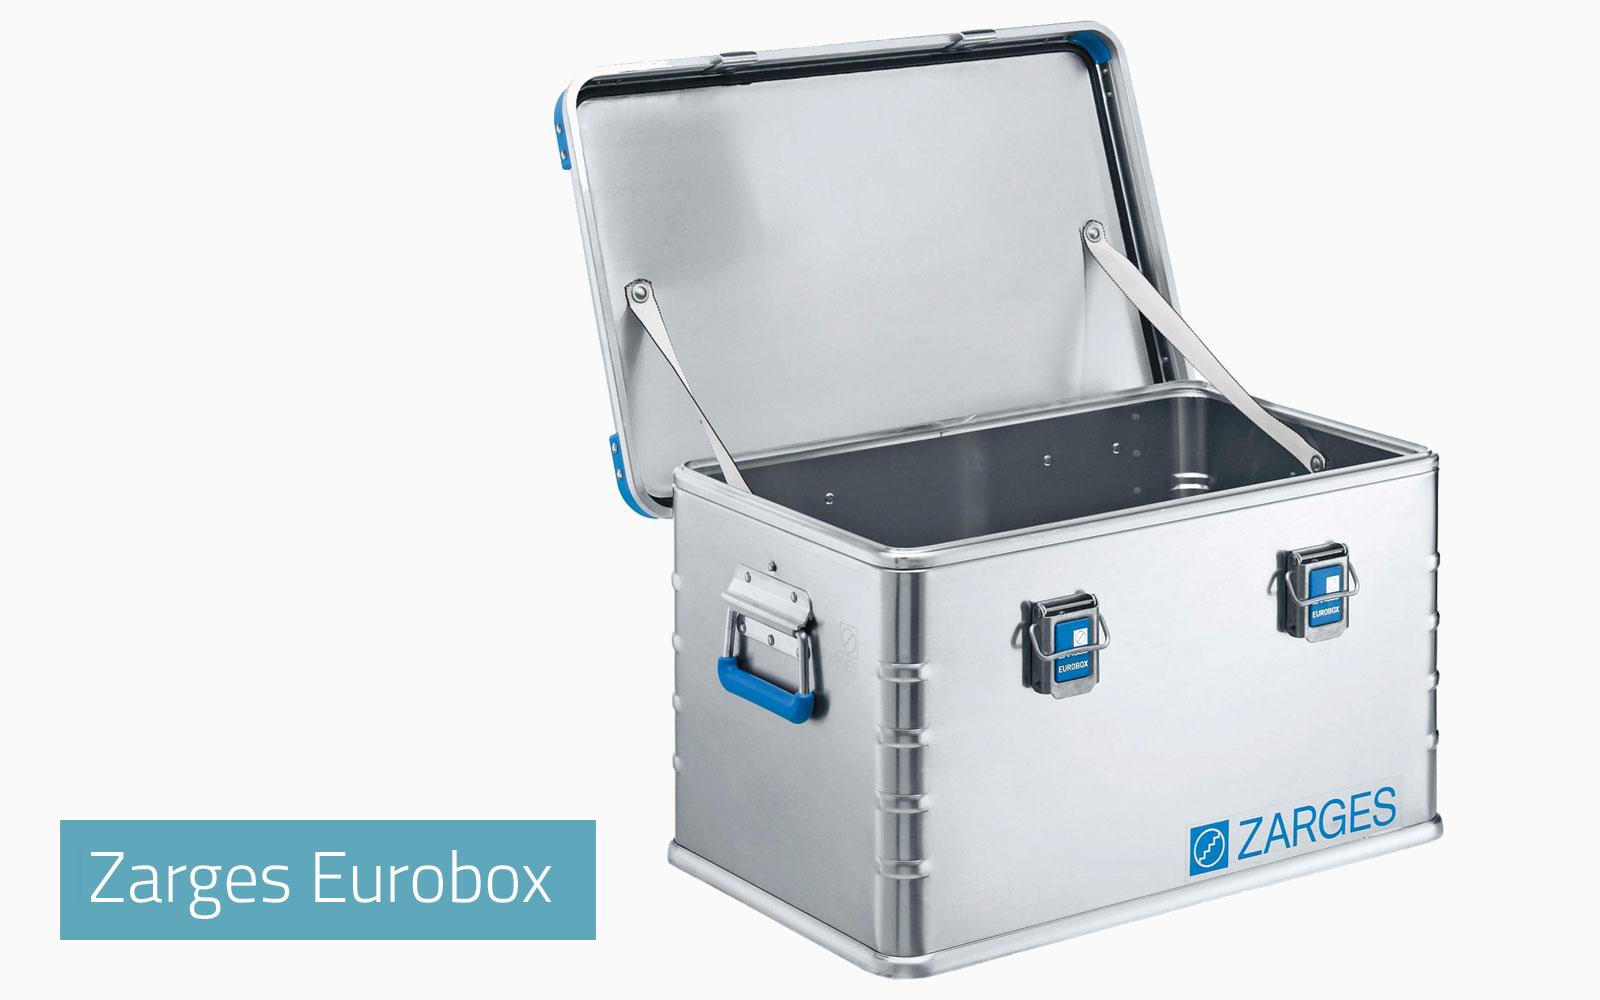 Zarges Eurobox